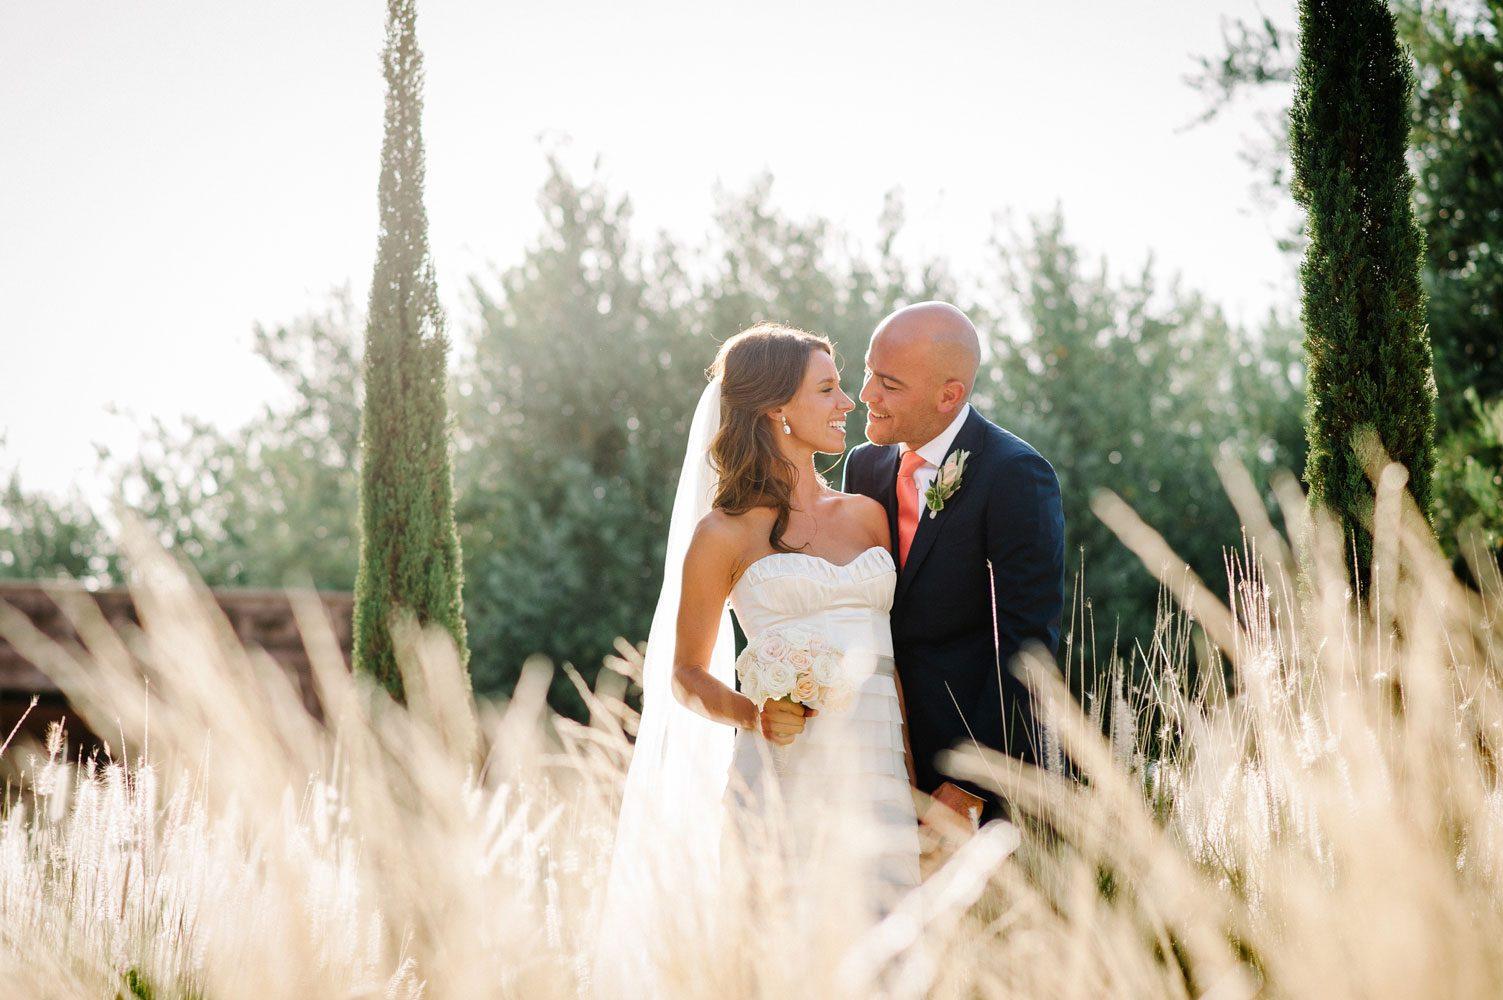 bride and groom pose in beldi country club garden wedding